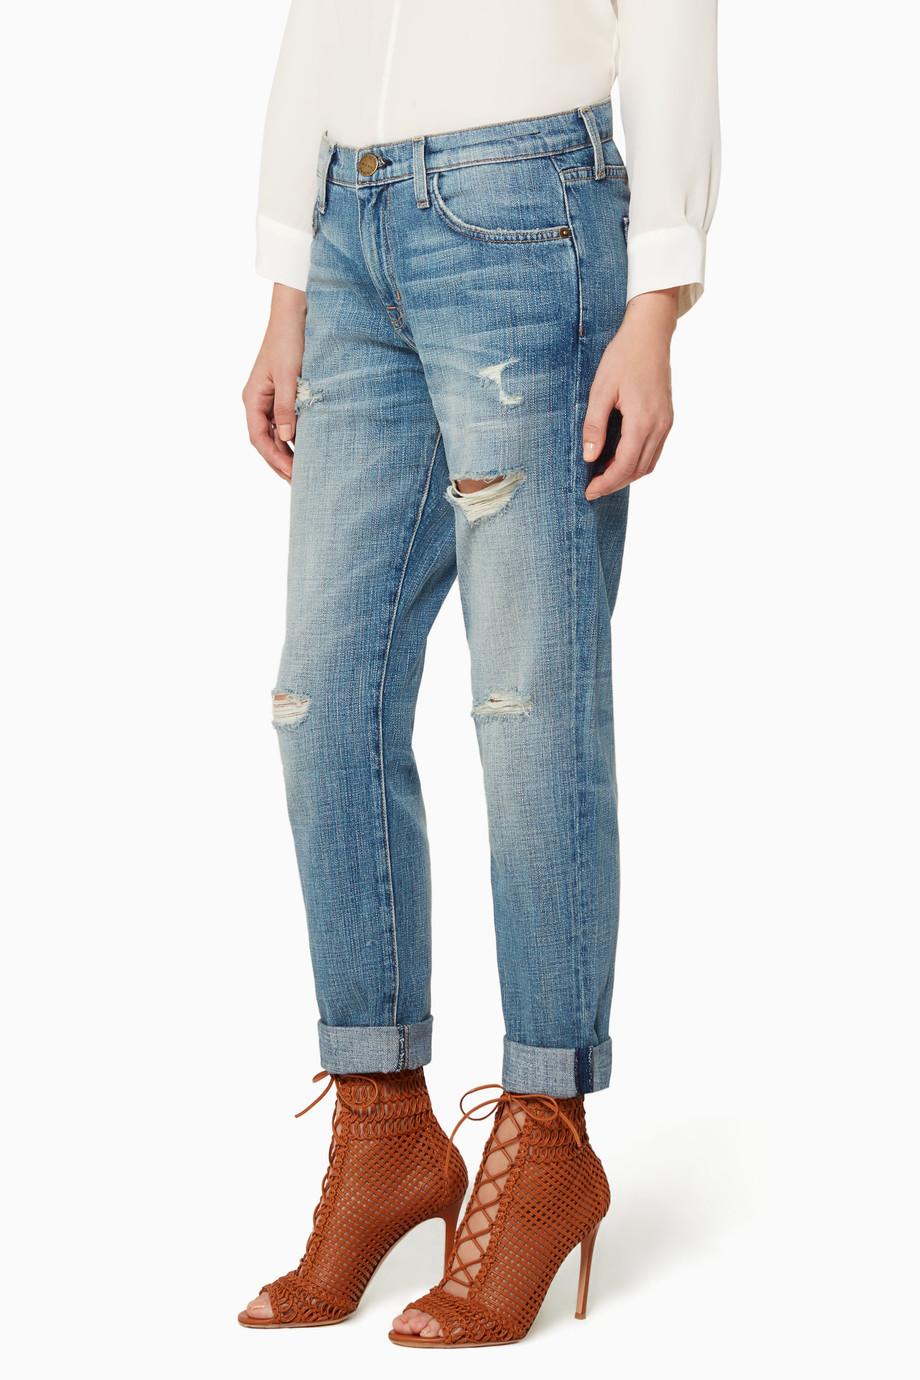 3c362a40612a4 تسوق بنطلون جينز ذا فلينج باللون الأزرق الفاتح Current Elliott أزرق ...